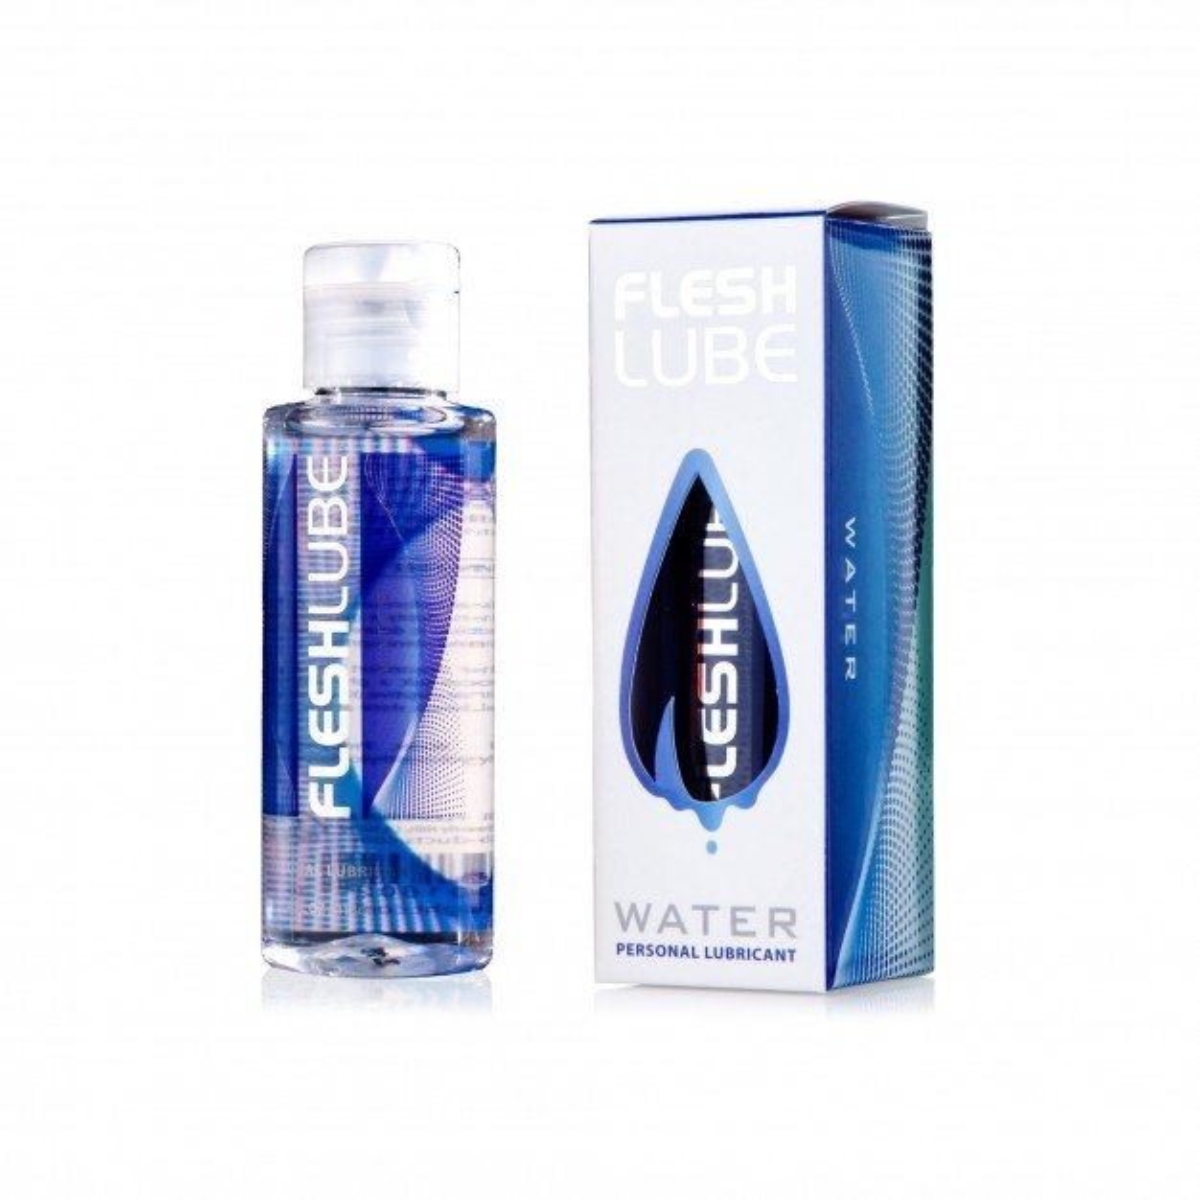 Fleshlight Fleshlube Water 100 ml, lubrikant na vodní bázi